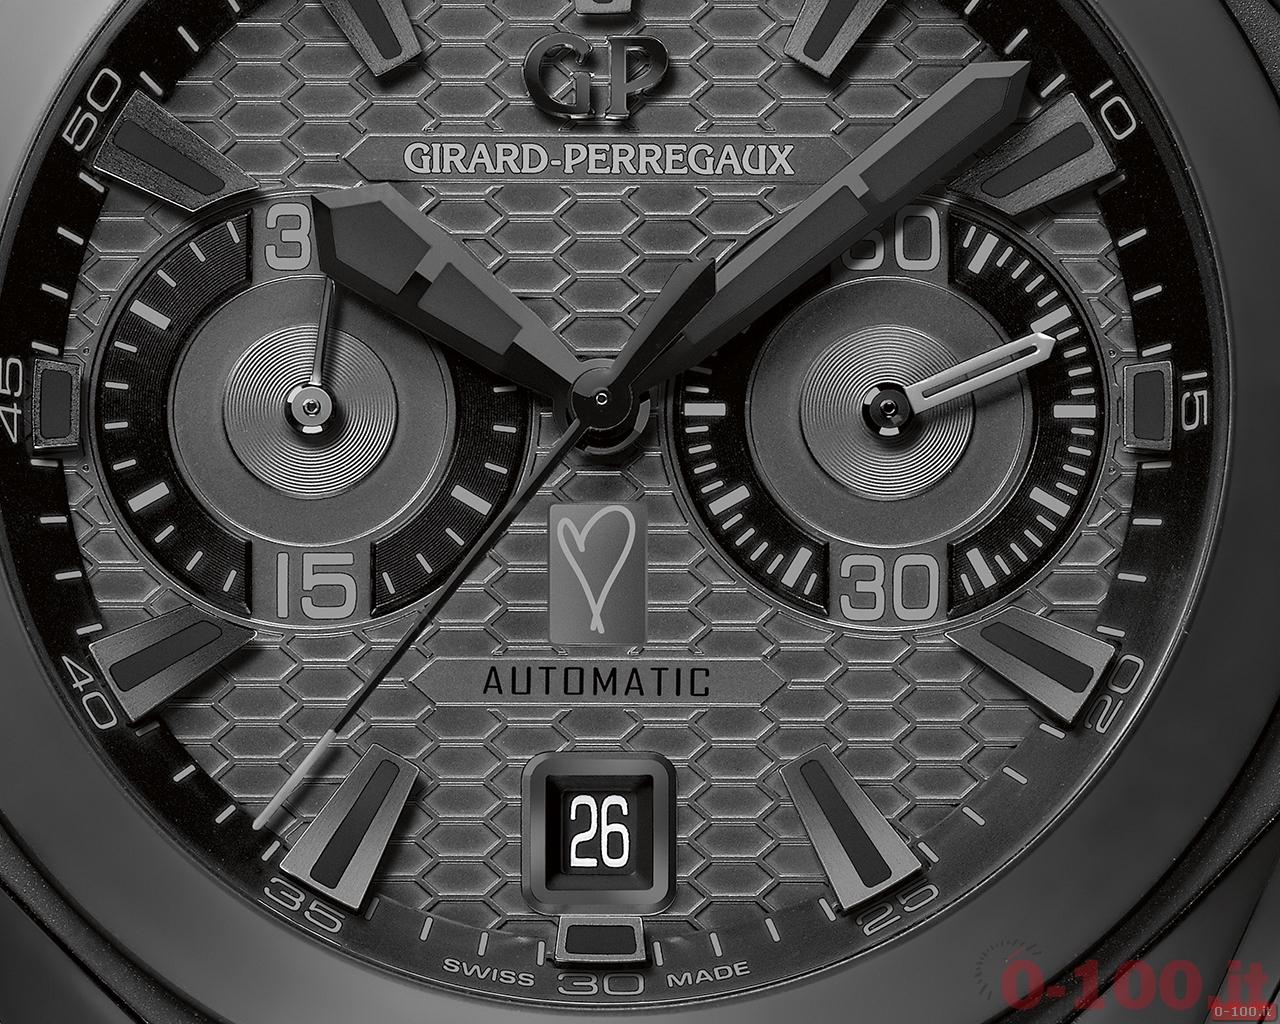 girard-perregaux-shadow-hawk-limited-edition-ref-49970-32-635-fk6a-family-nile-rodgers-0-100_3